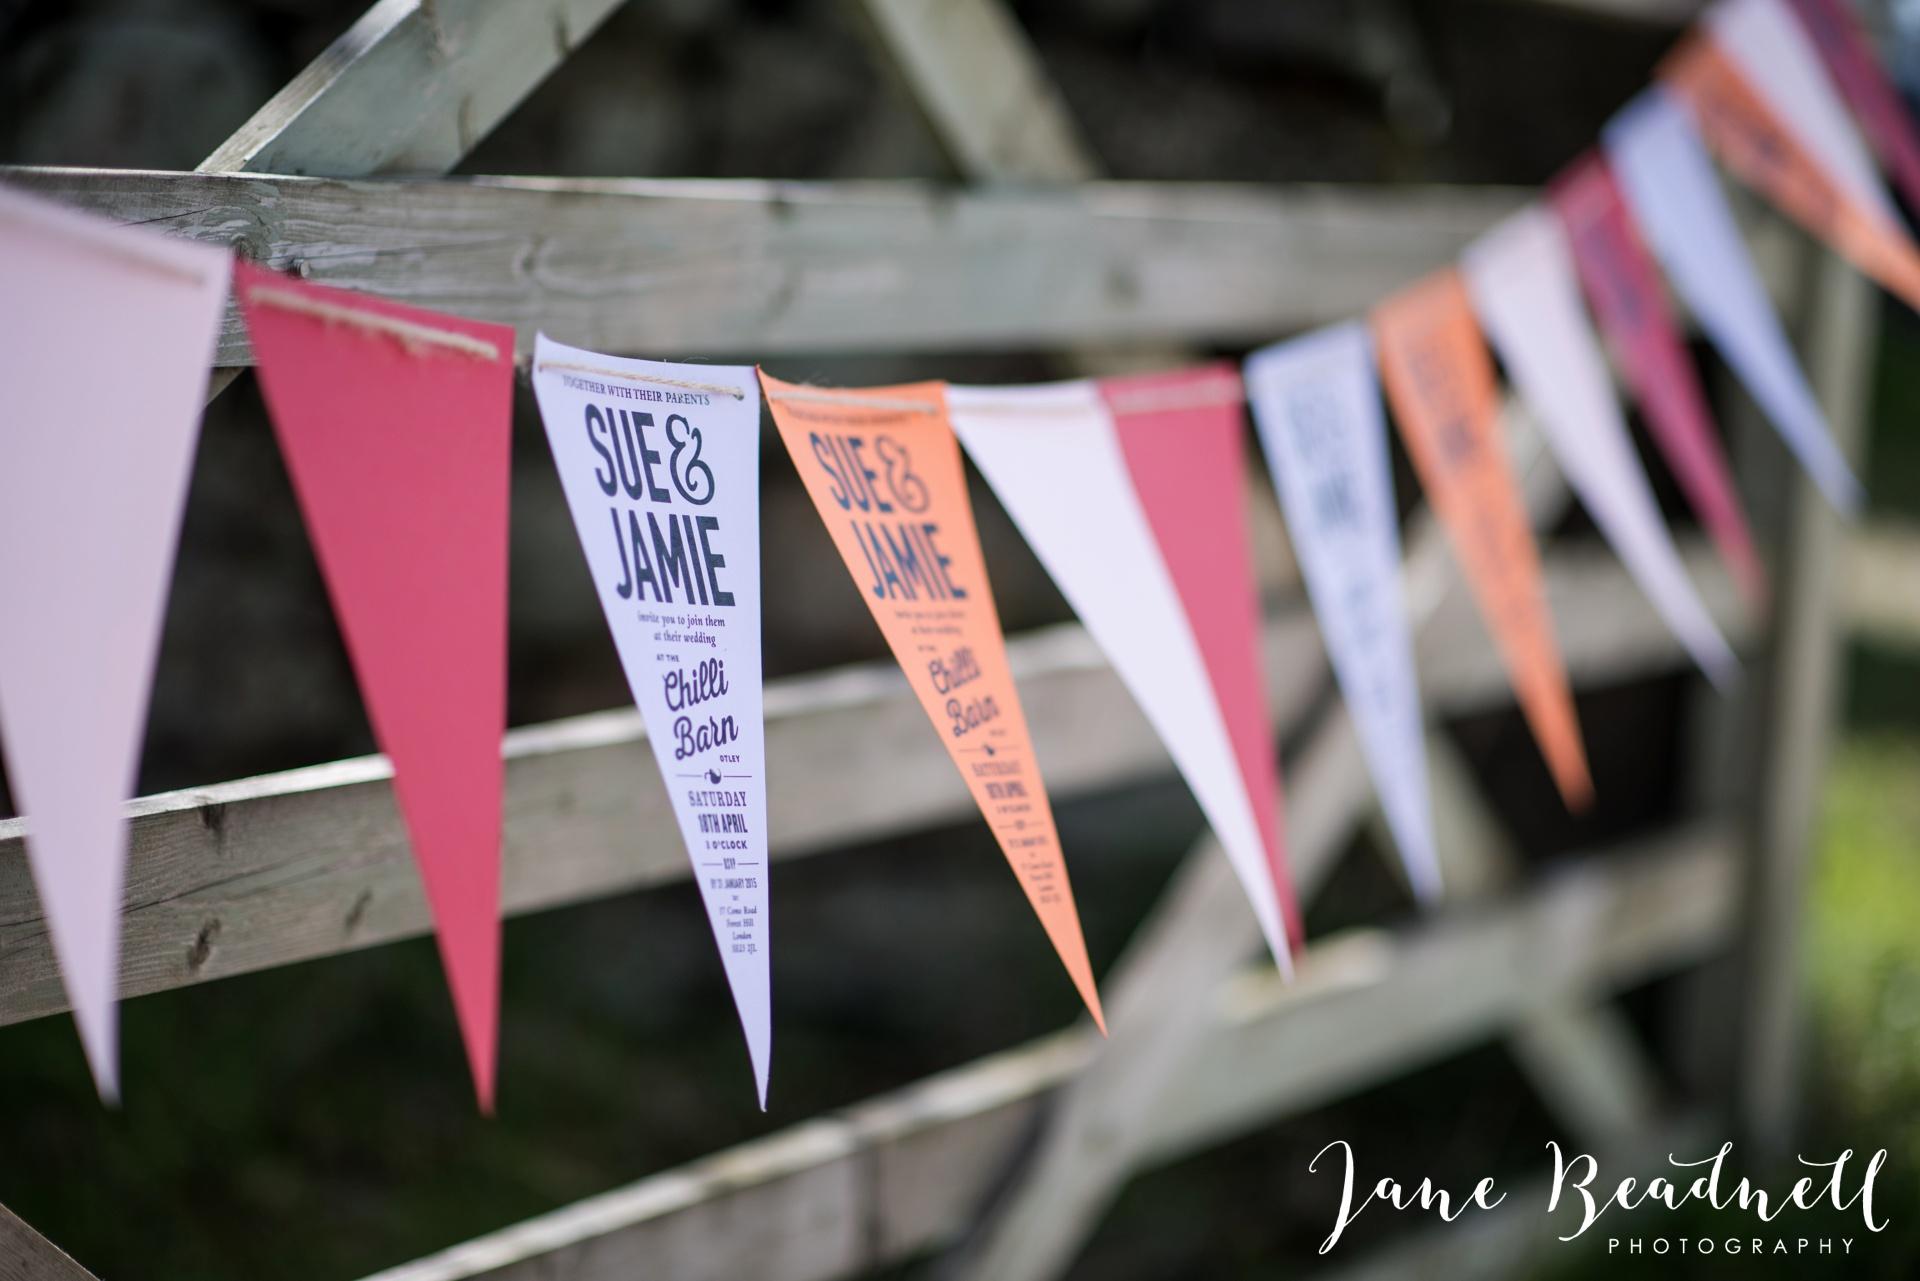 Jane Beadnell fine art wedding photographer The Cheerful Chilli Barn Otley_0003